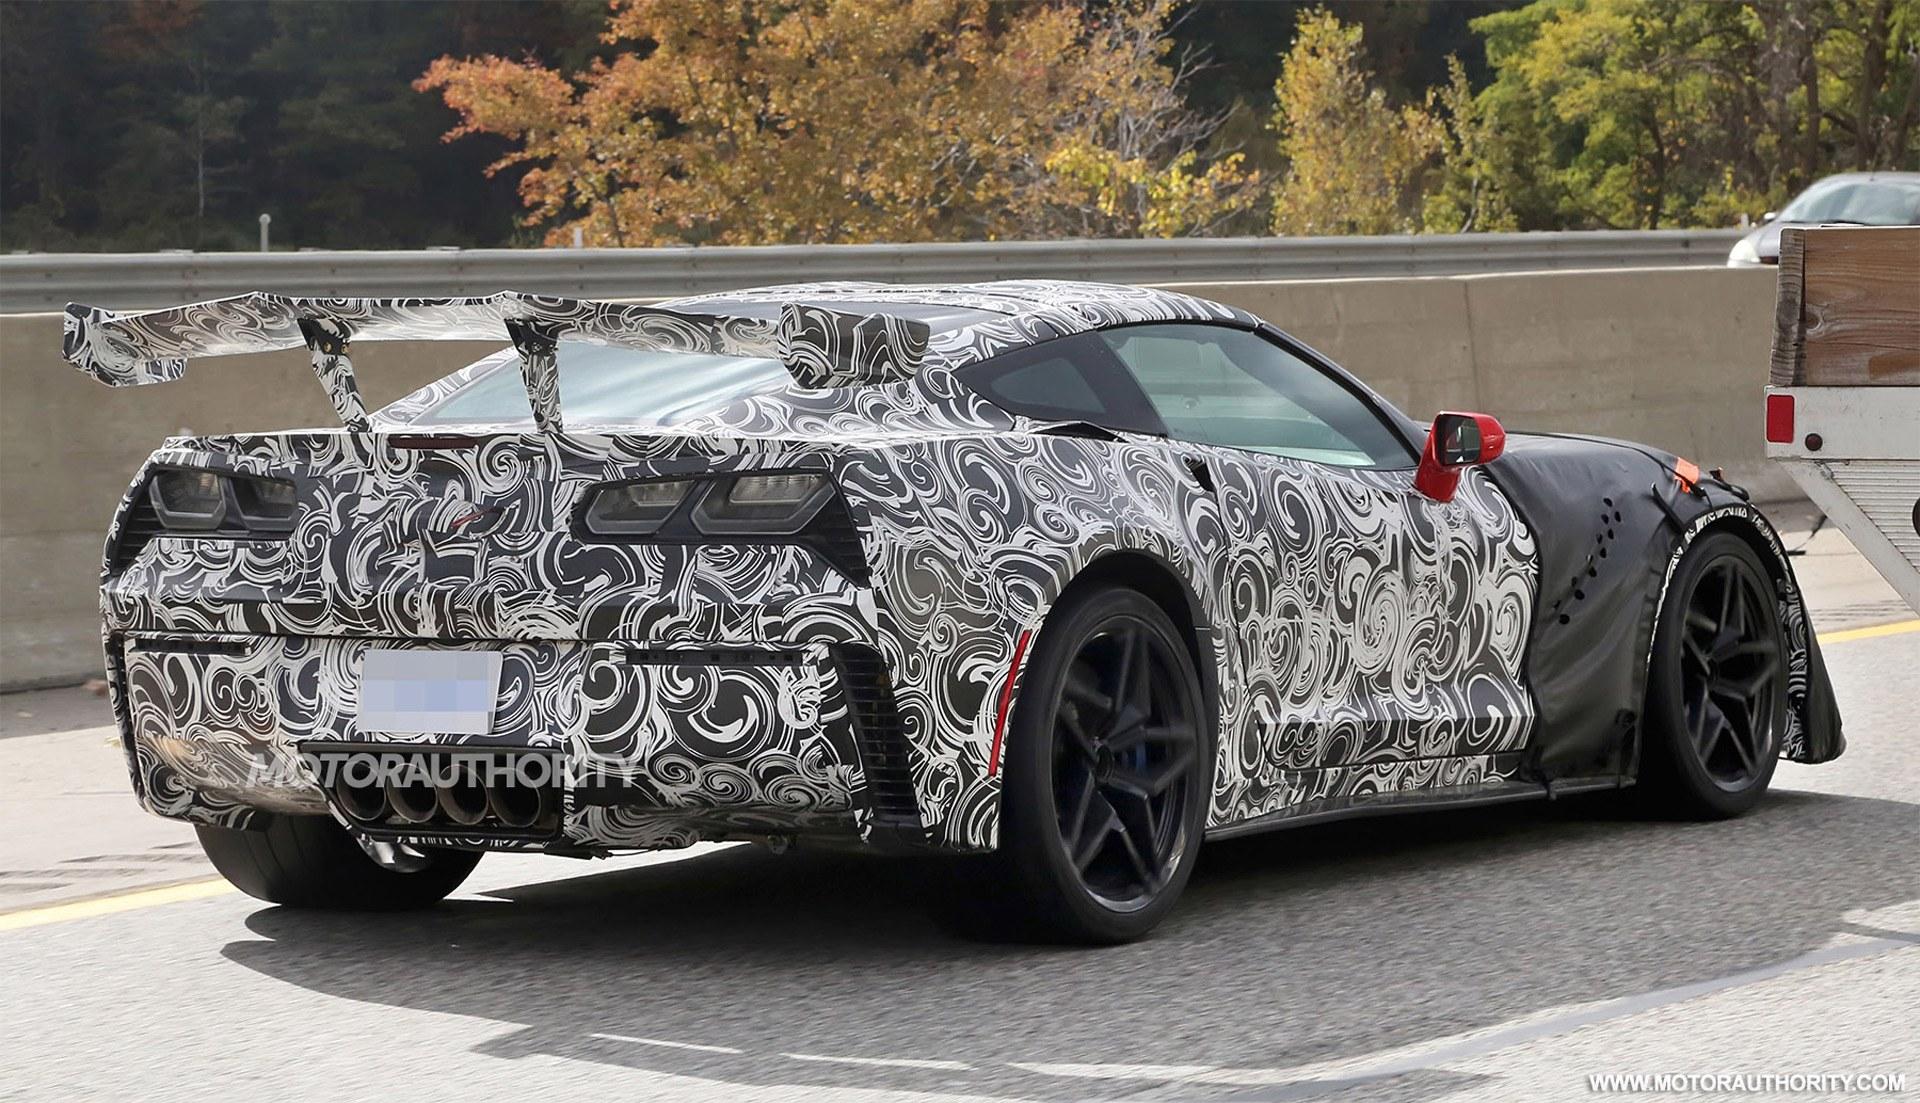 Spied: 2018 Chevrolet Corvette ZR1 - Eagle Ridge GM